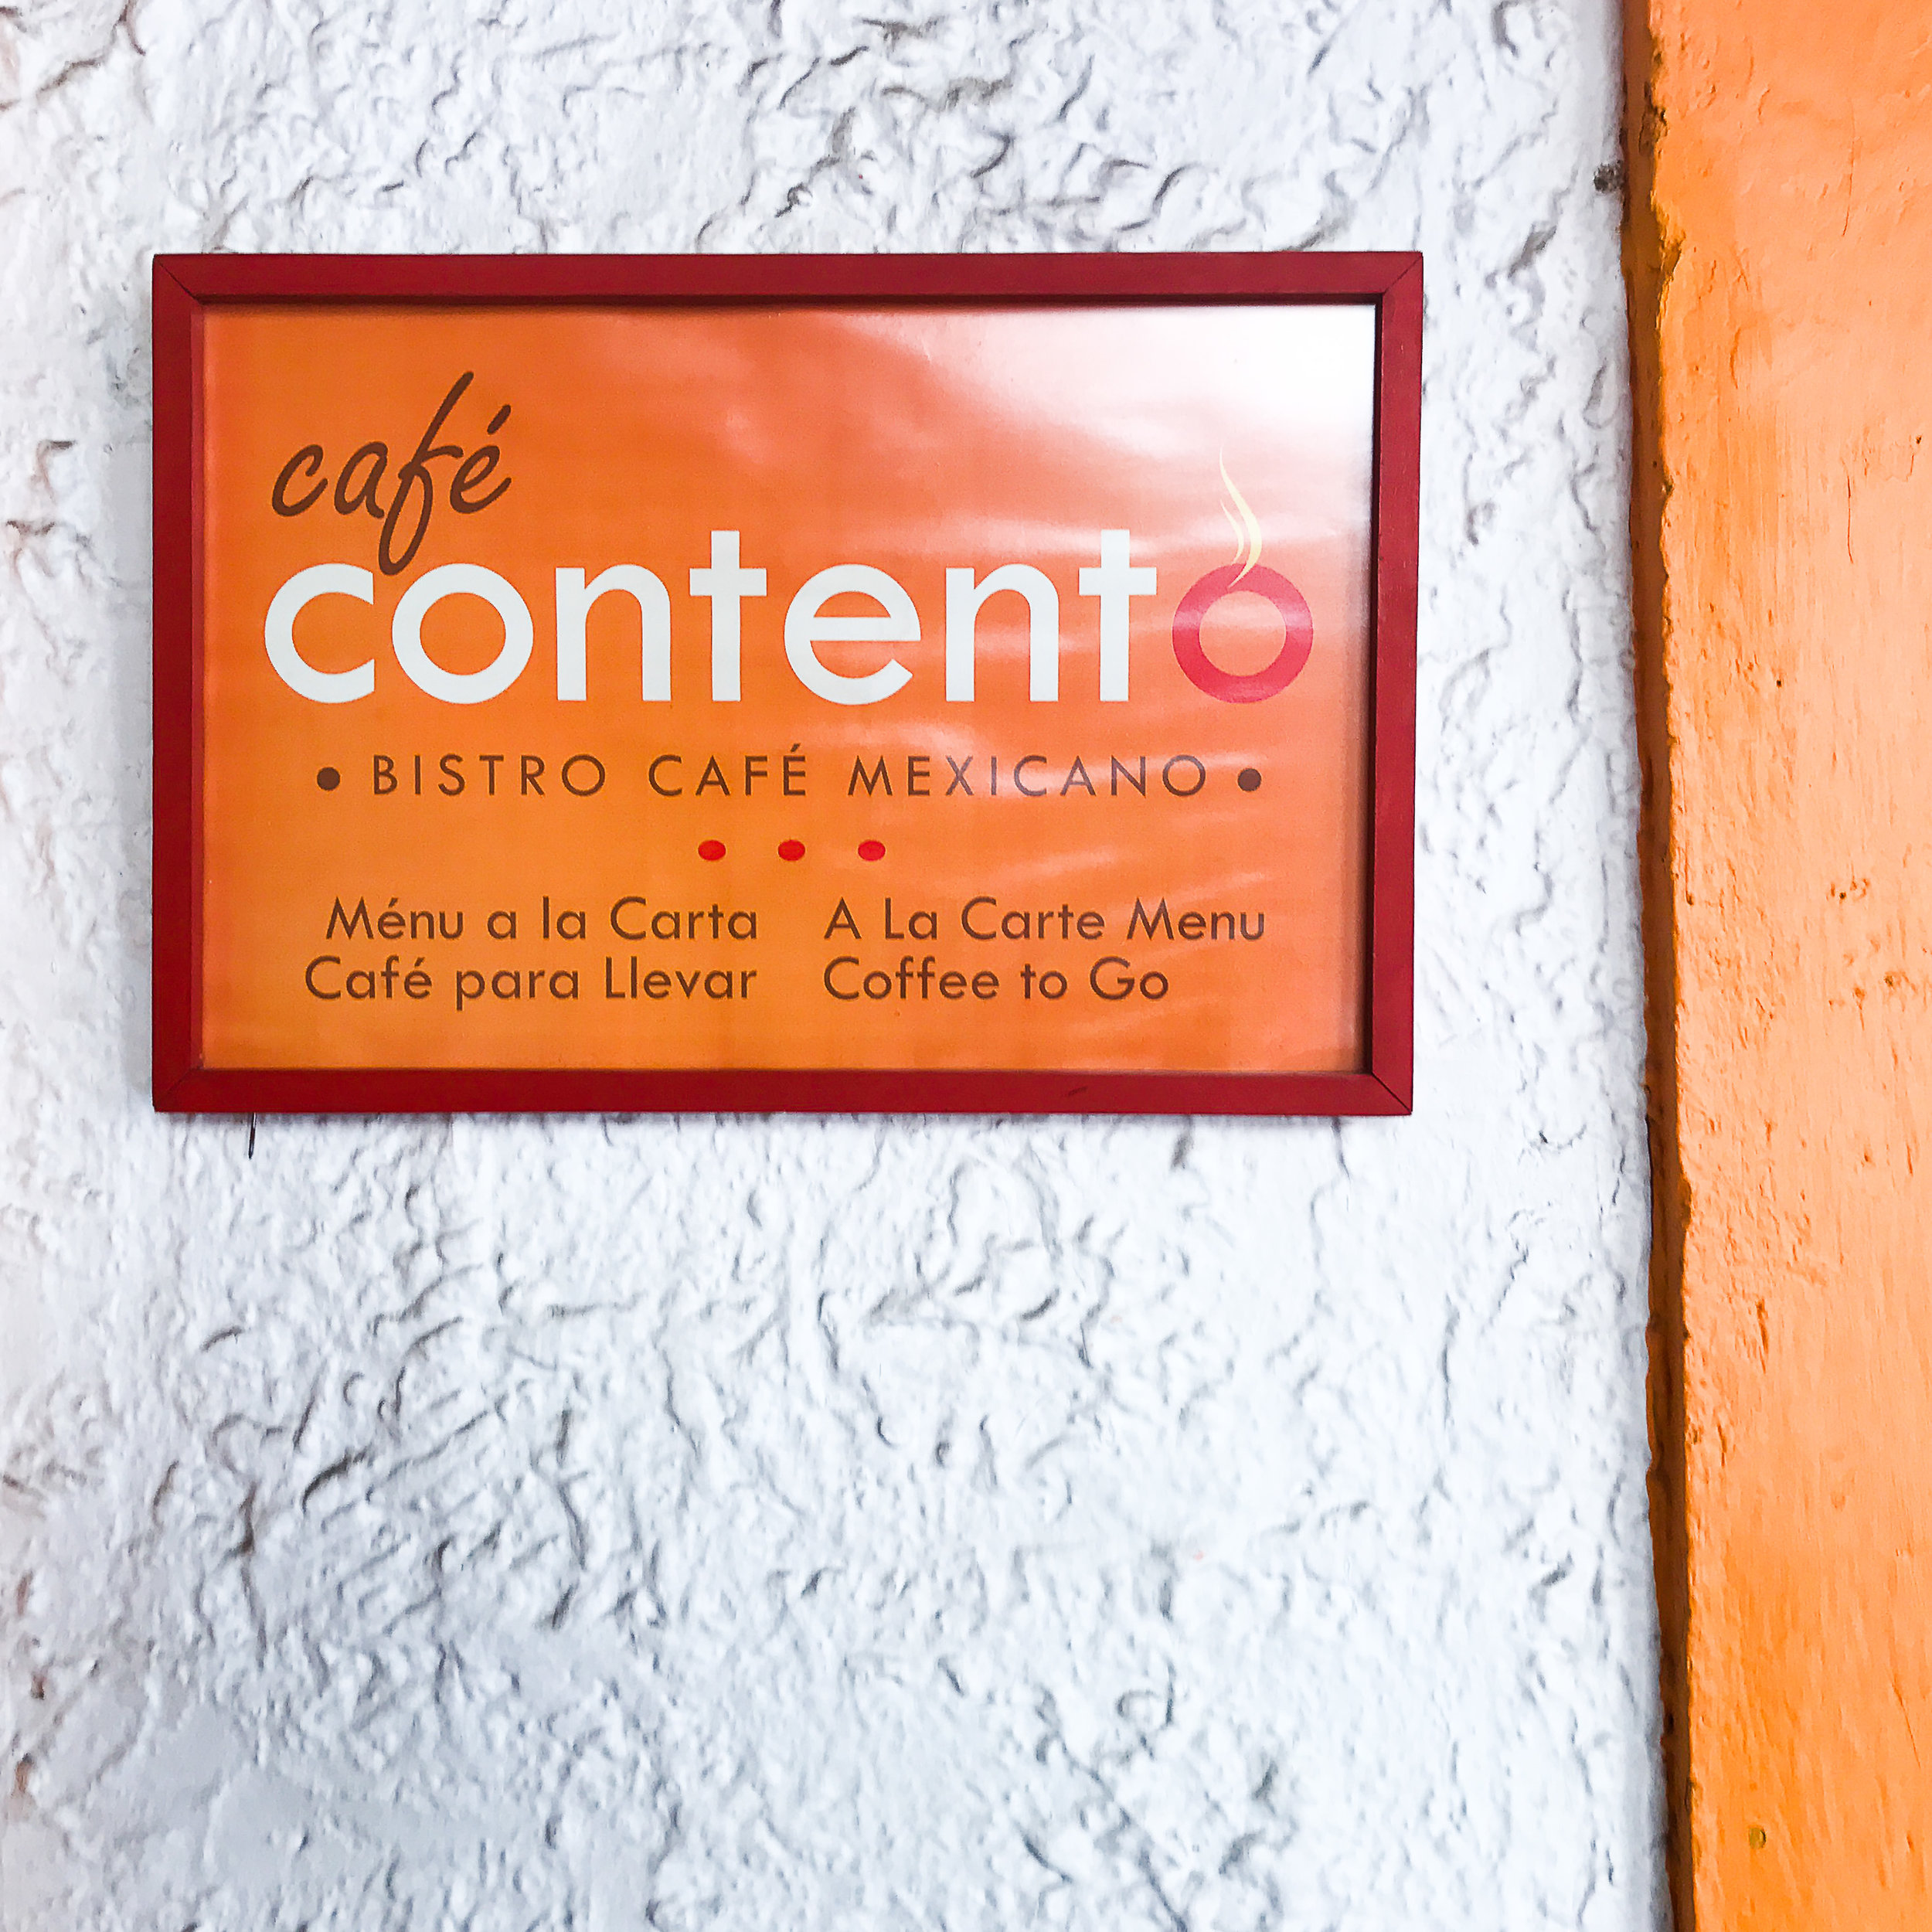 mexican-food-san-miguel-de-allende-restuarants-coffee-cafes-1.jpg